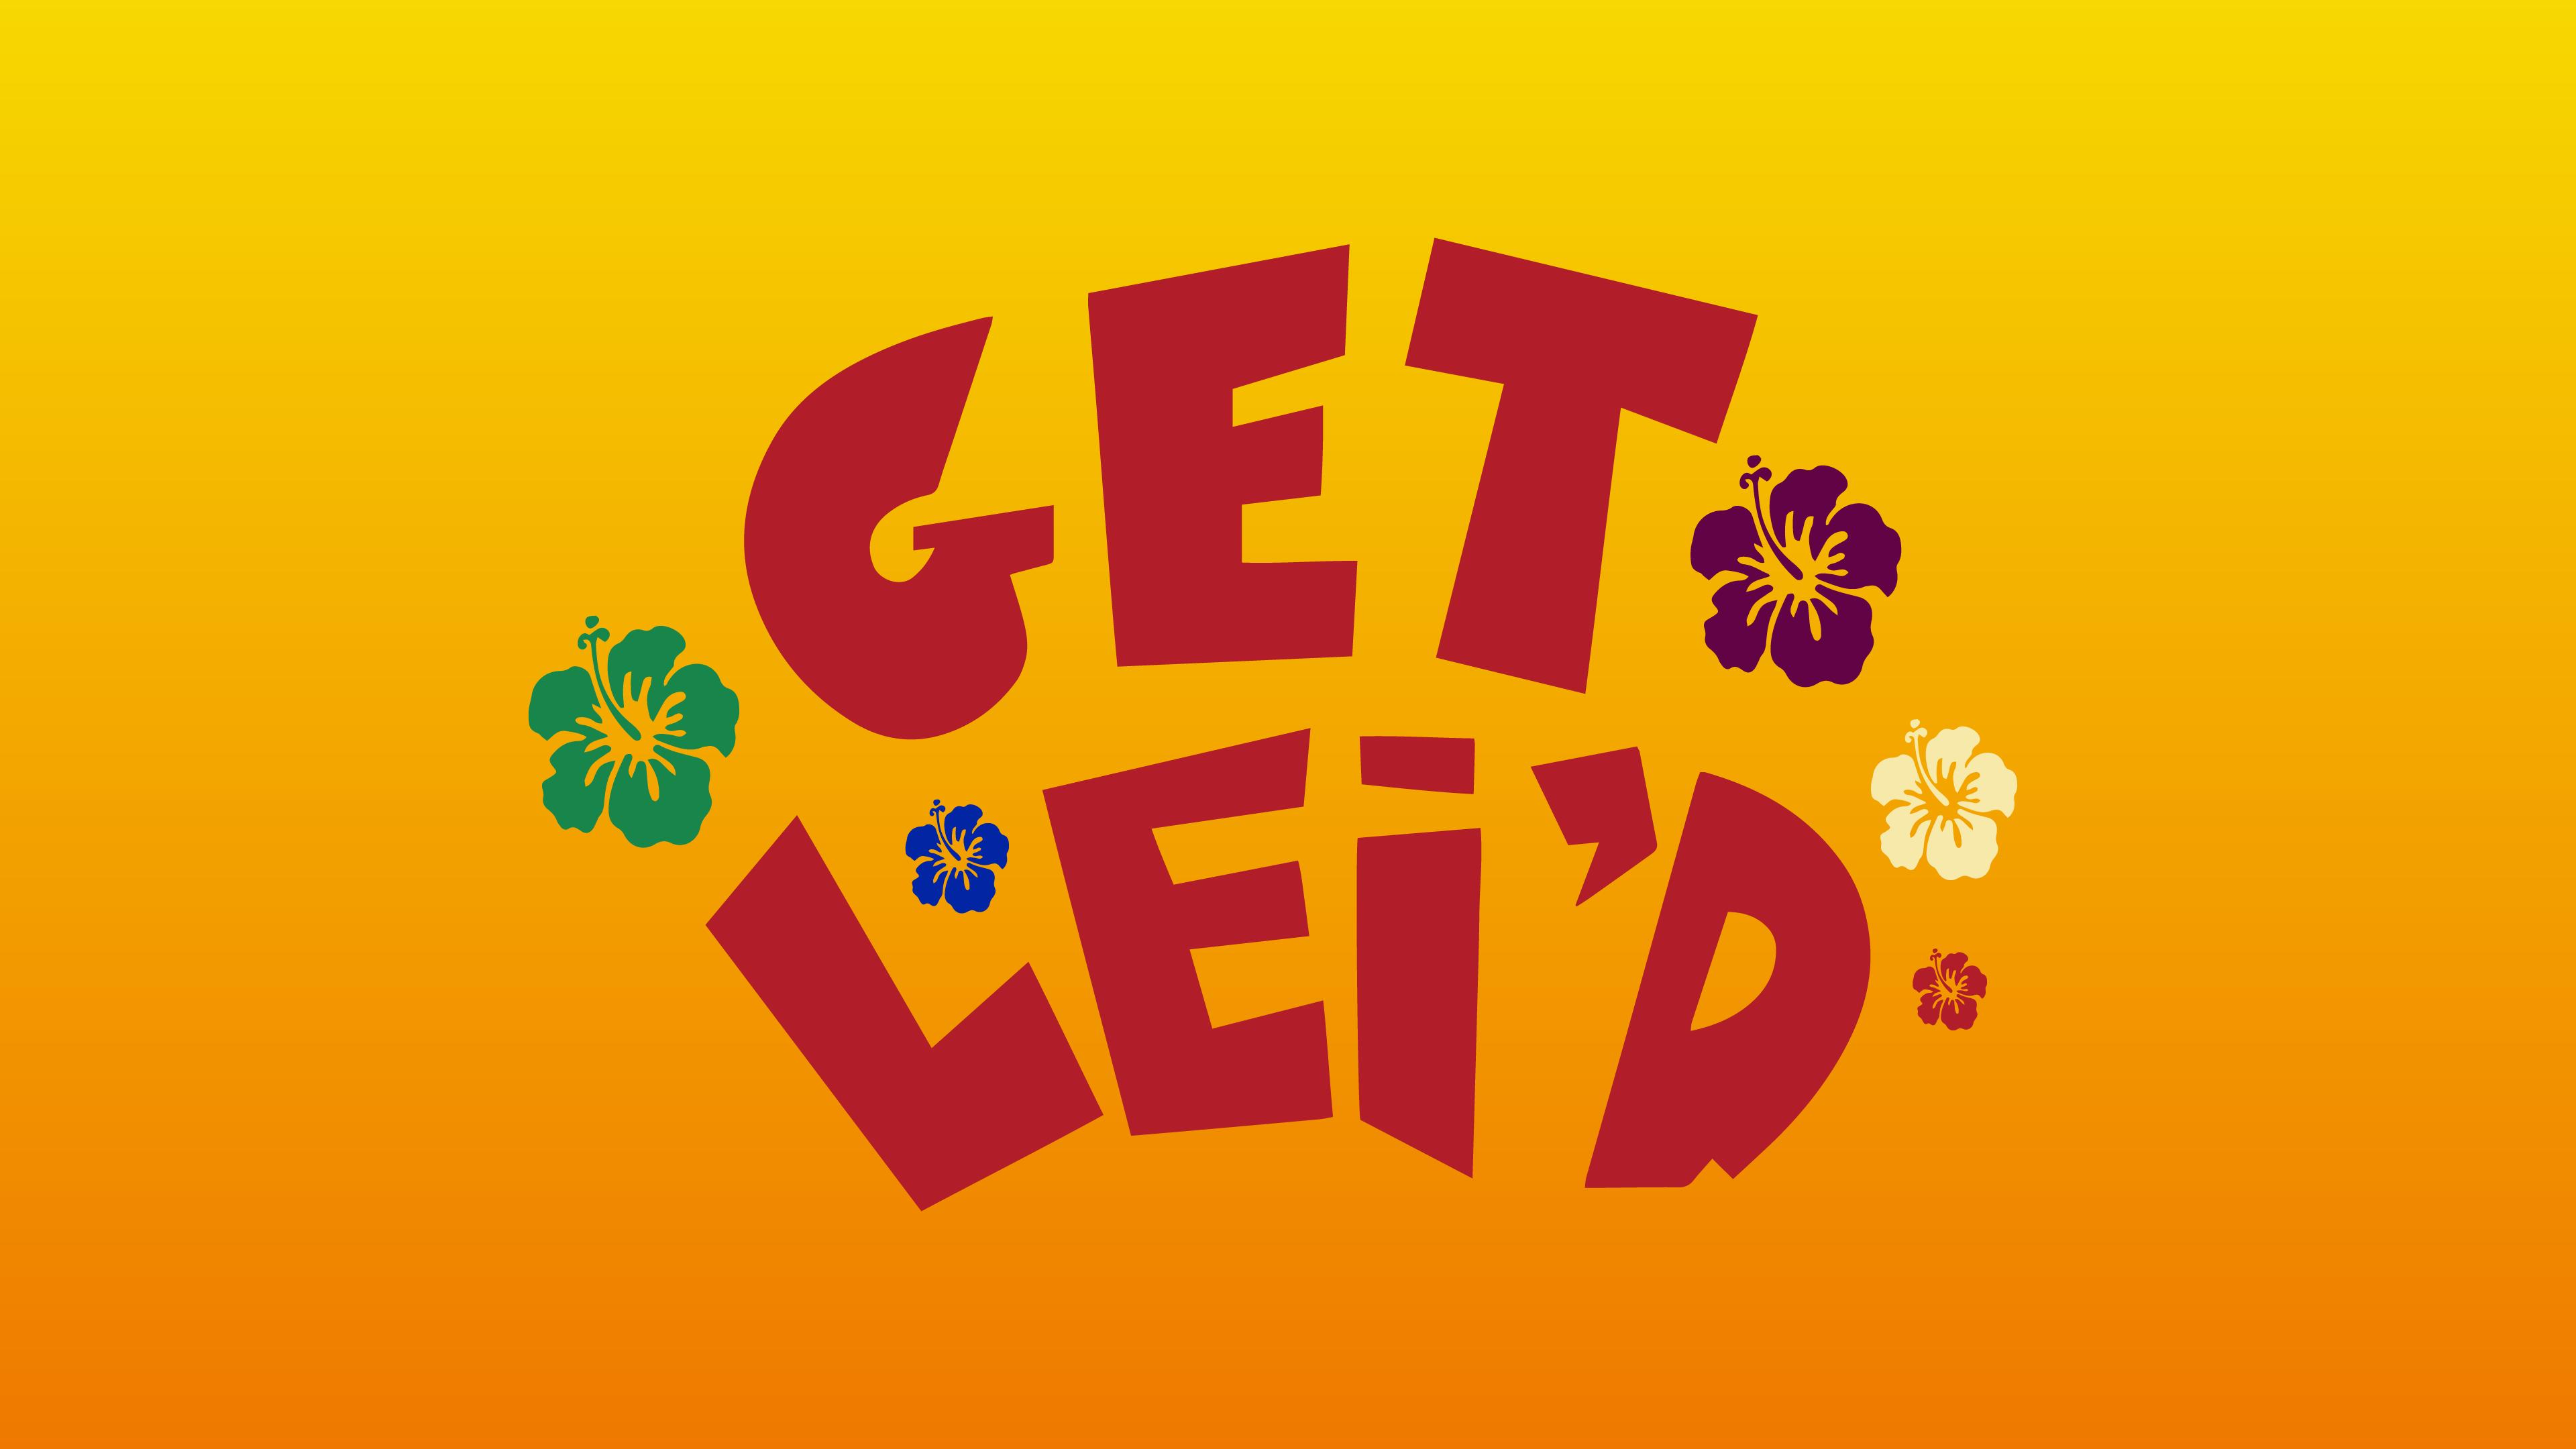 Get Lei'd